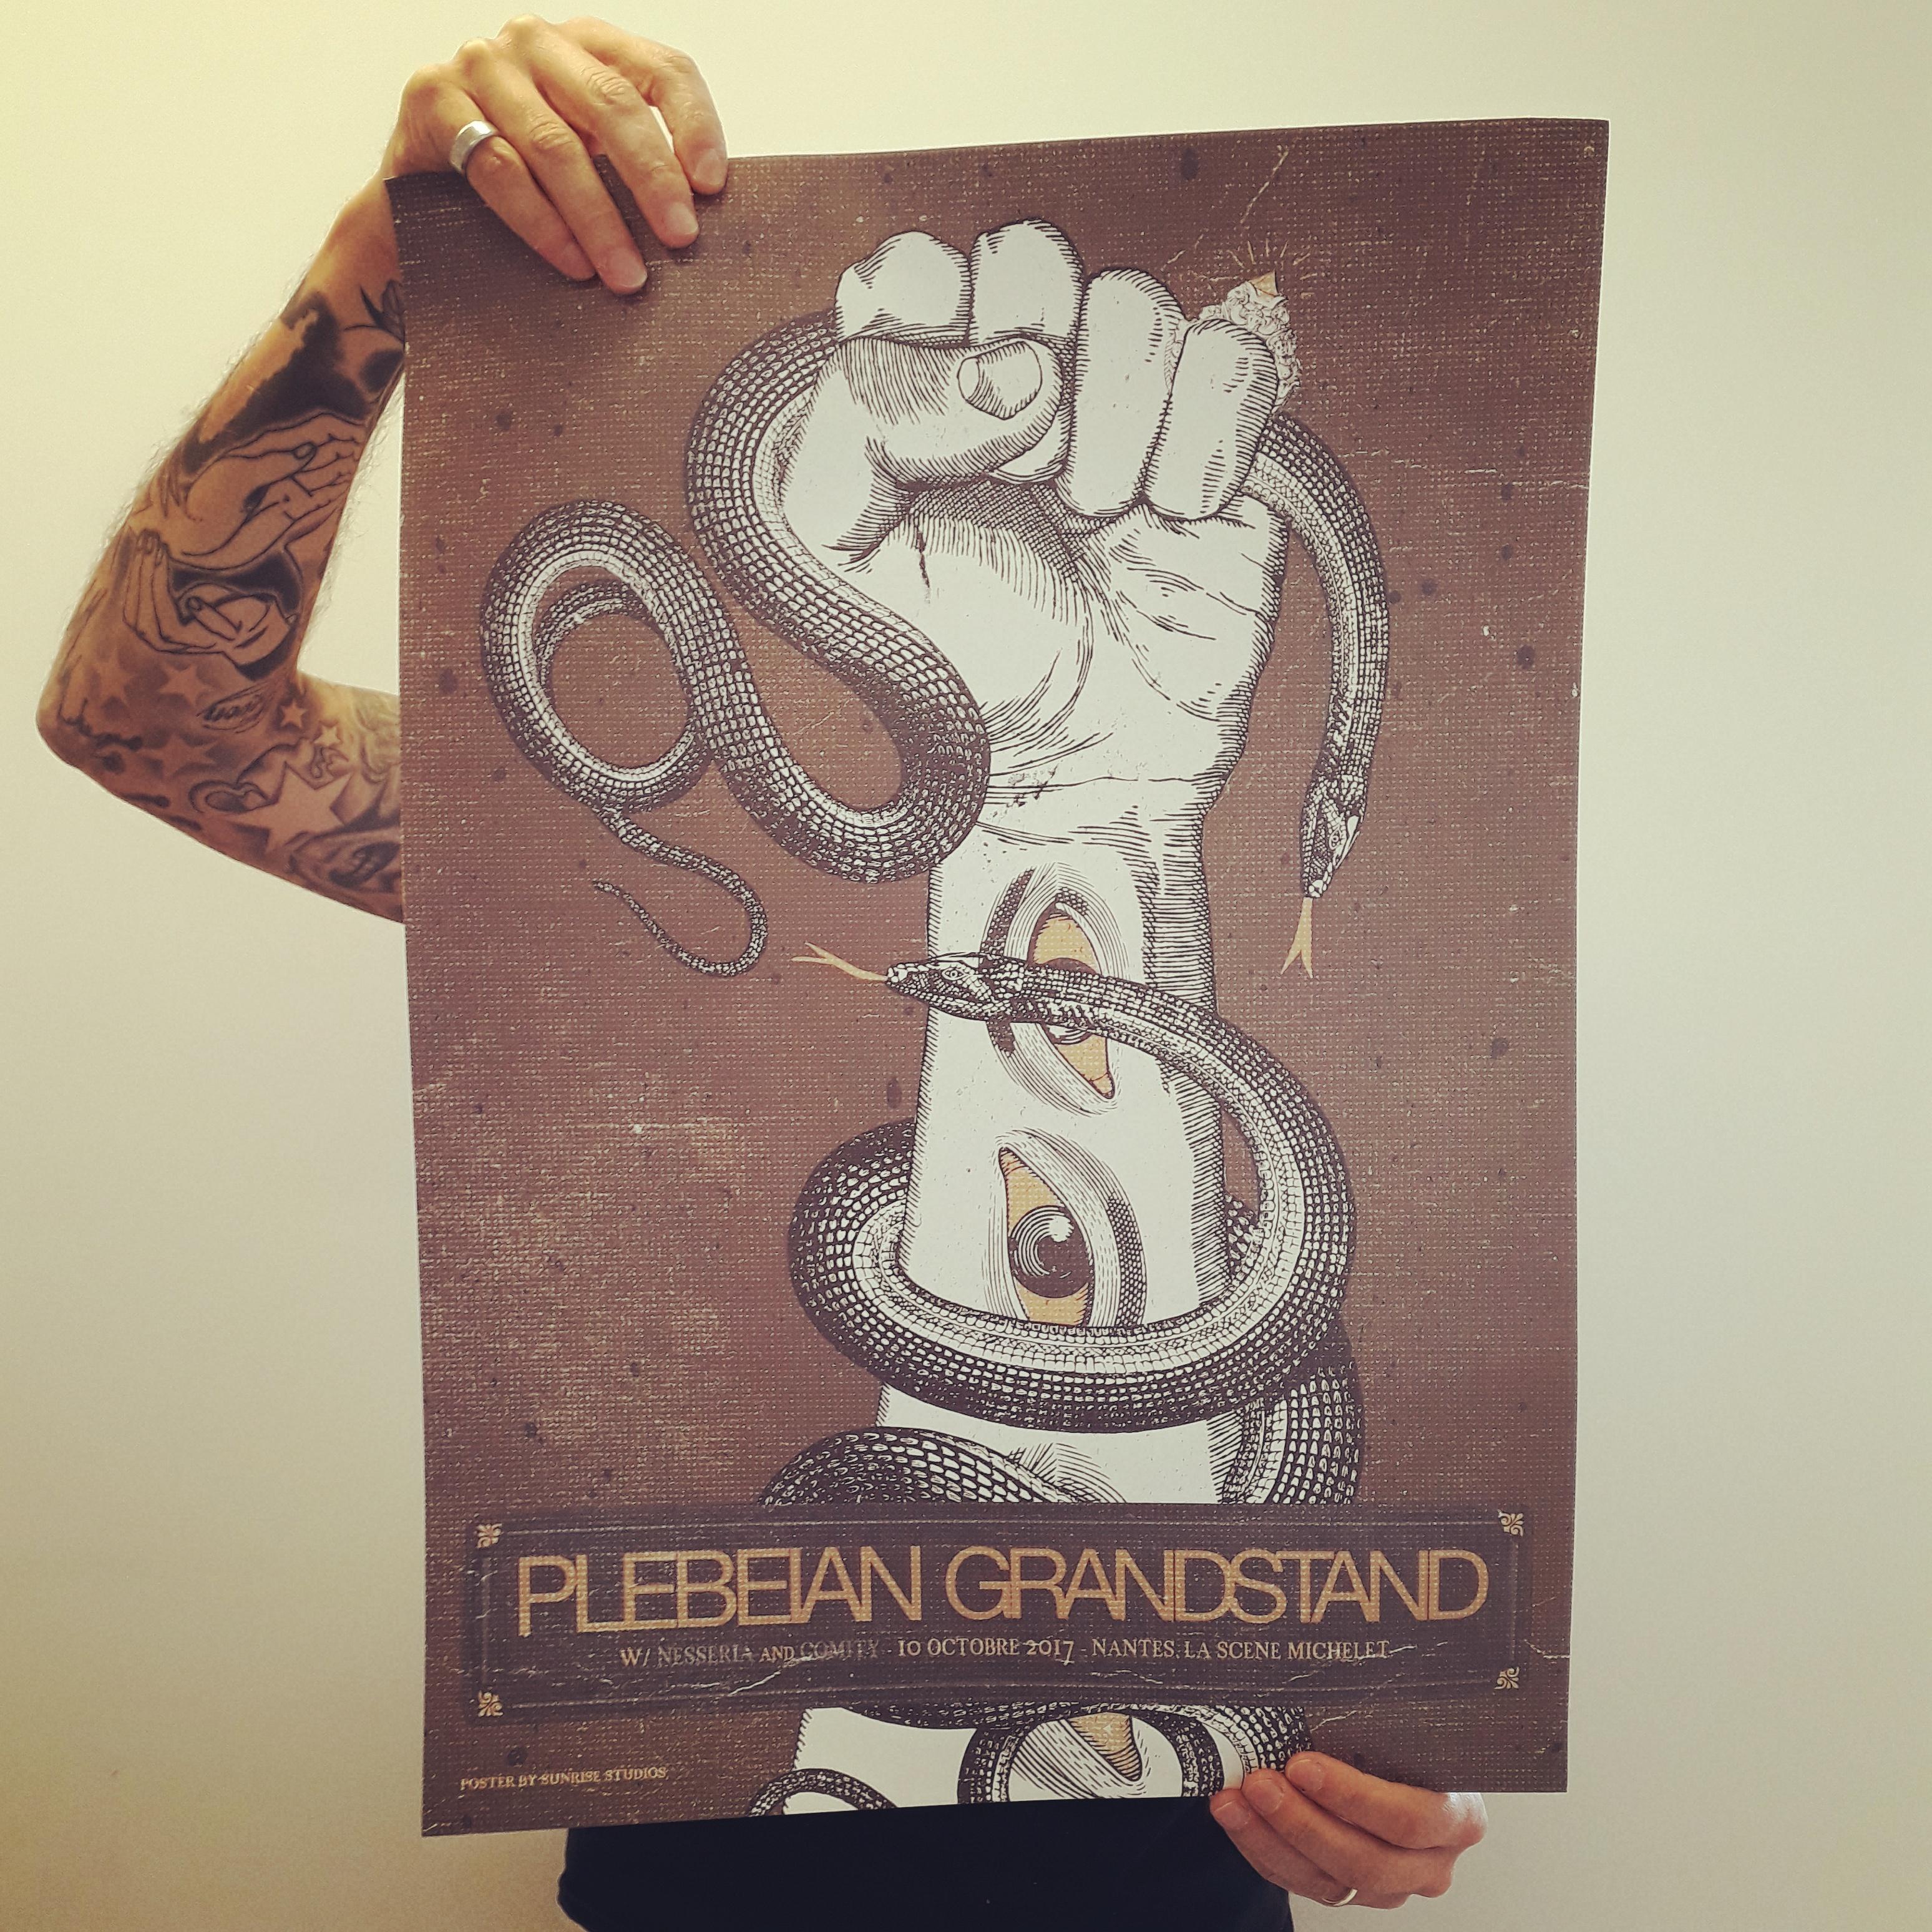 PLEBEIAN GRANDSTAND Show poster